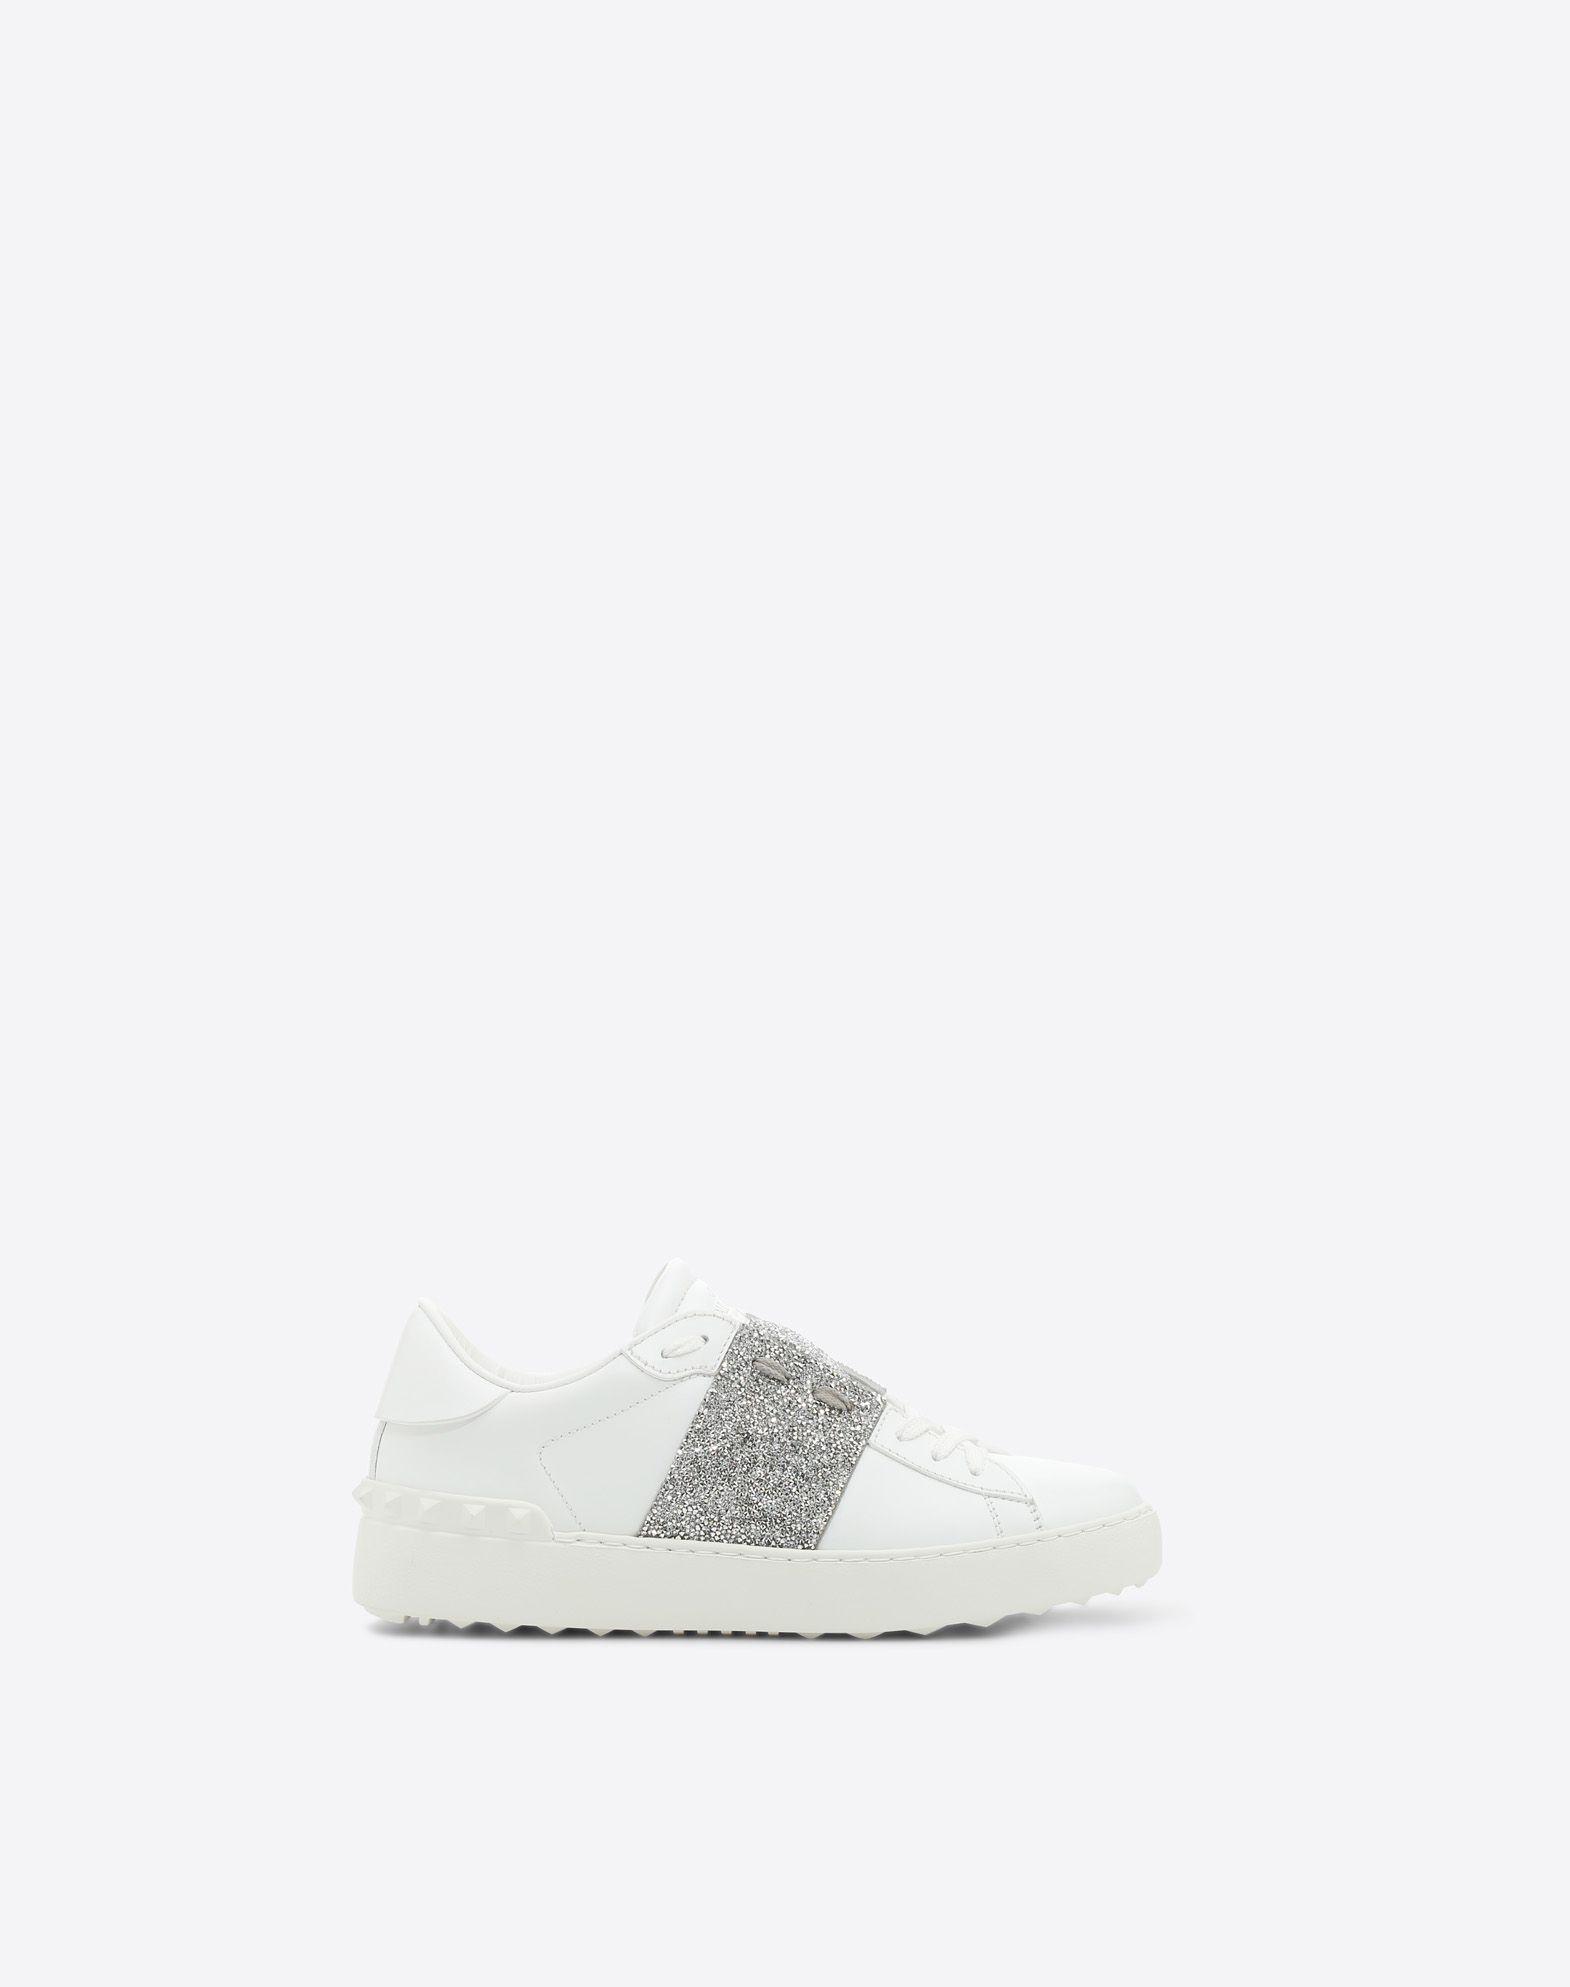 Valentino Garavani Two-tone Metallic Leather Sneakers - White Valentino Q5mxY9aVt1